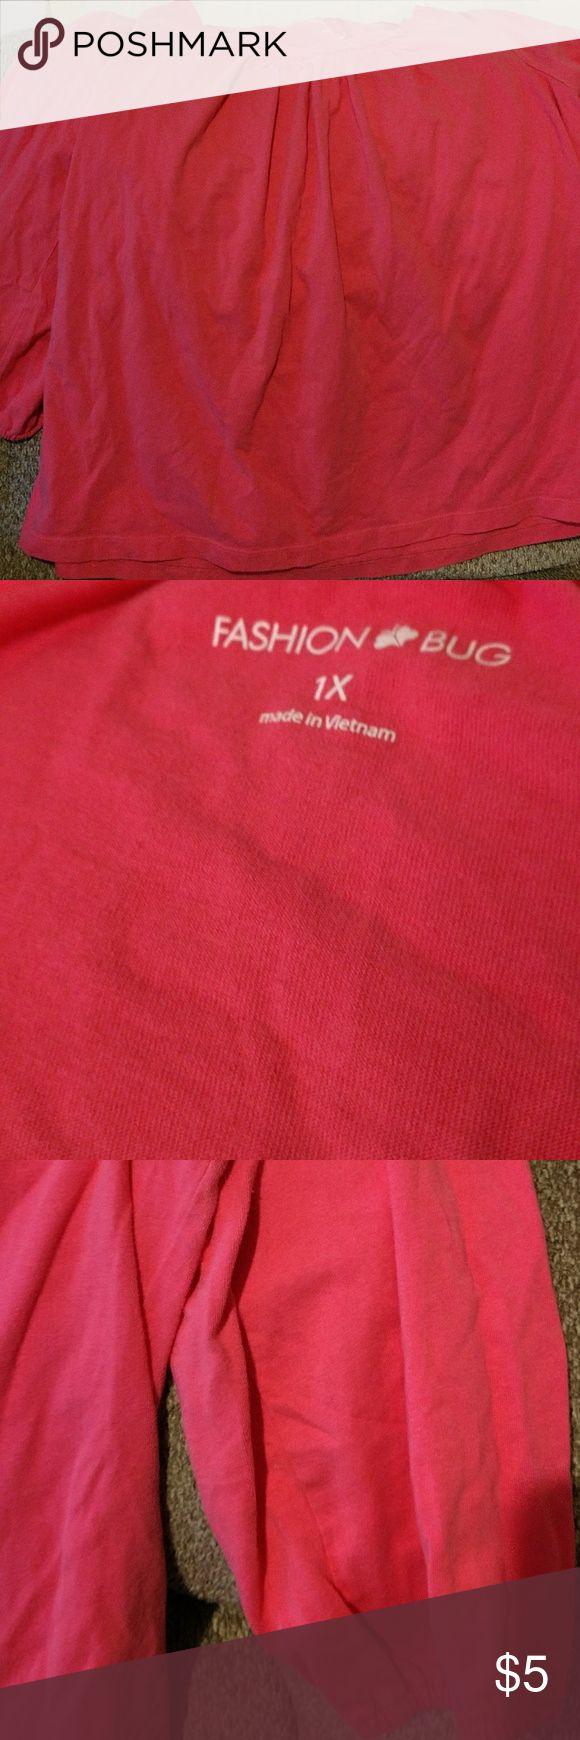 1x coral shirt 1x Fashion Bug coral shirt 3/4 sleeves lightly used Fashion Bug Tops Blouses